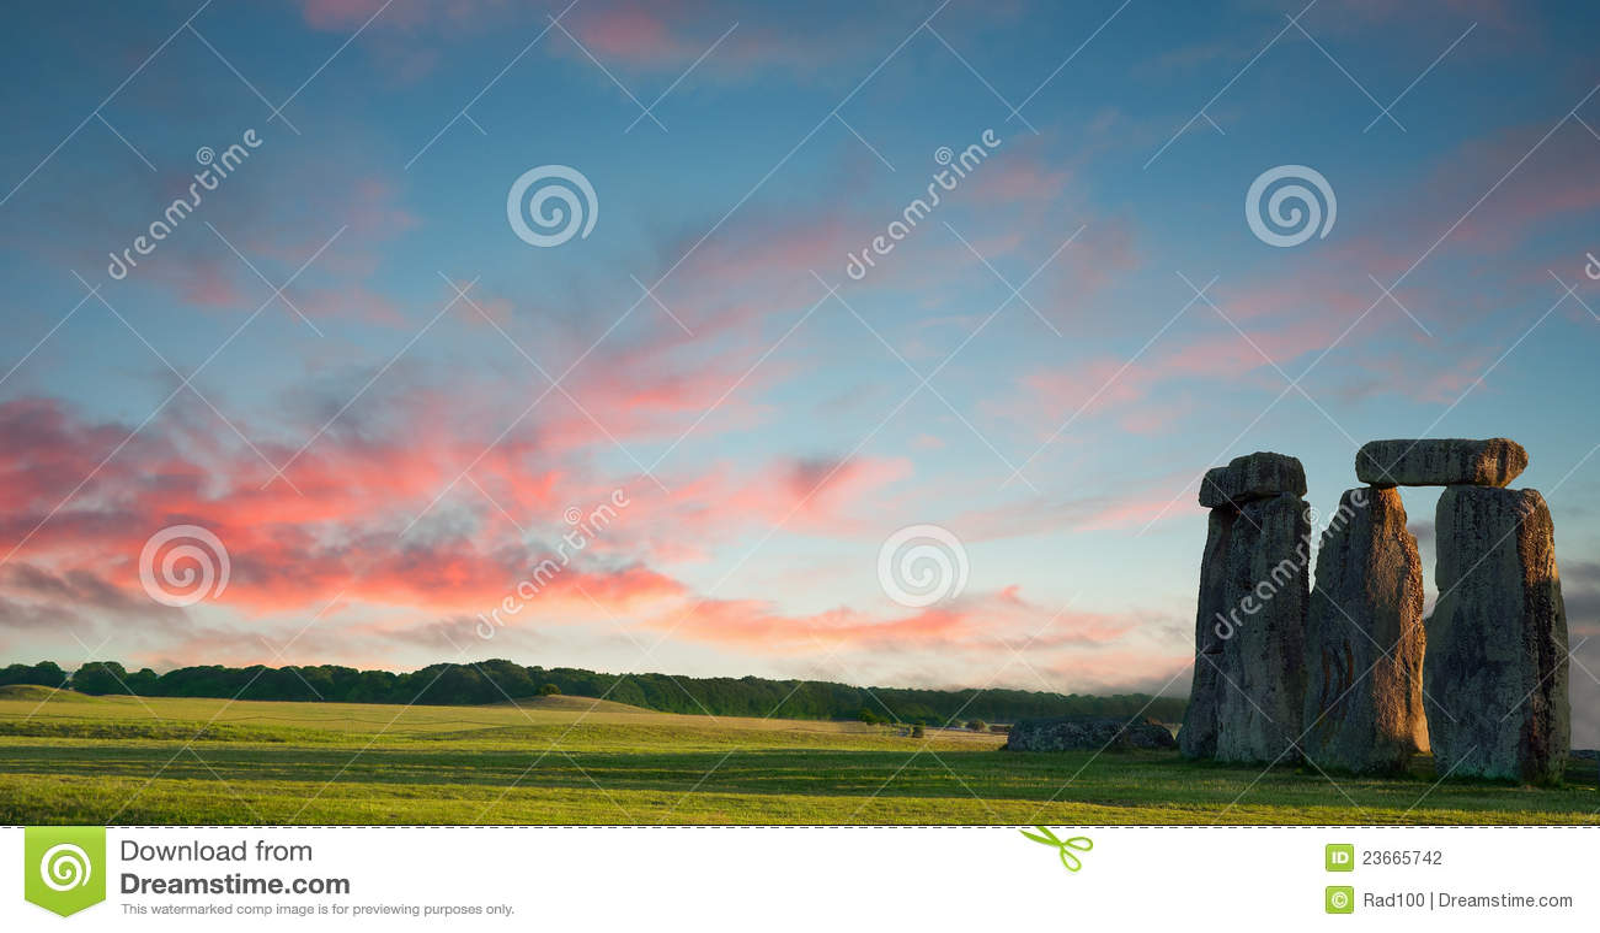 Stonehenge against a purple blue sky